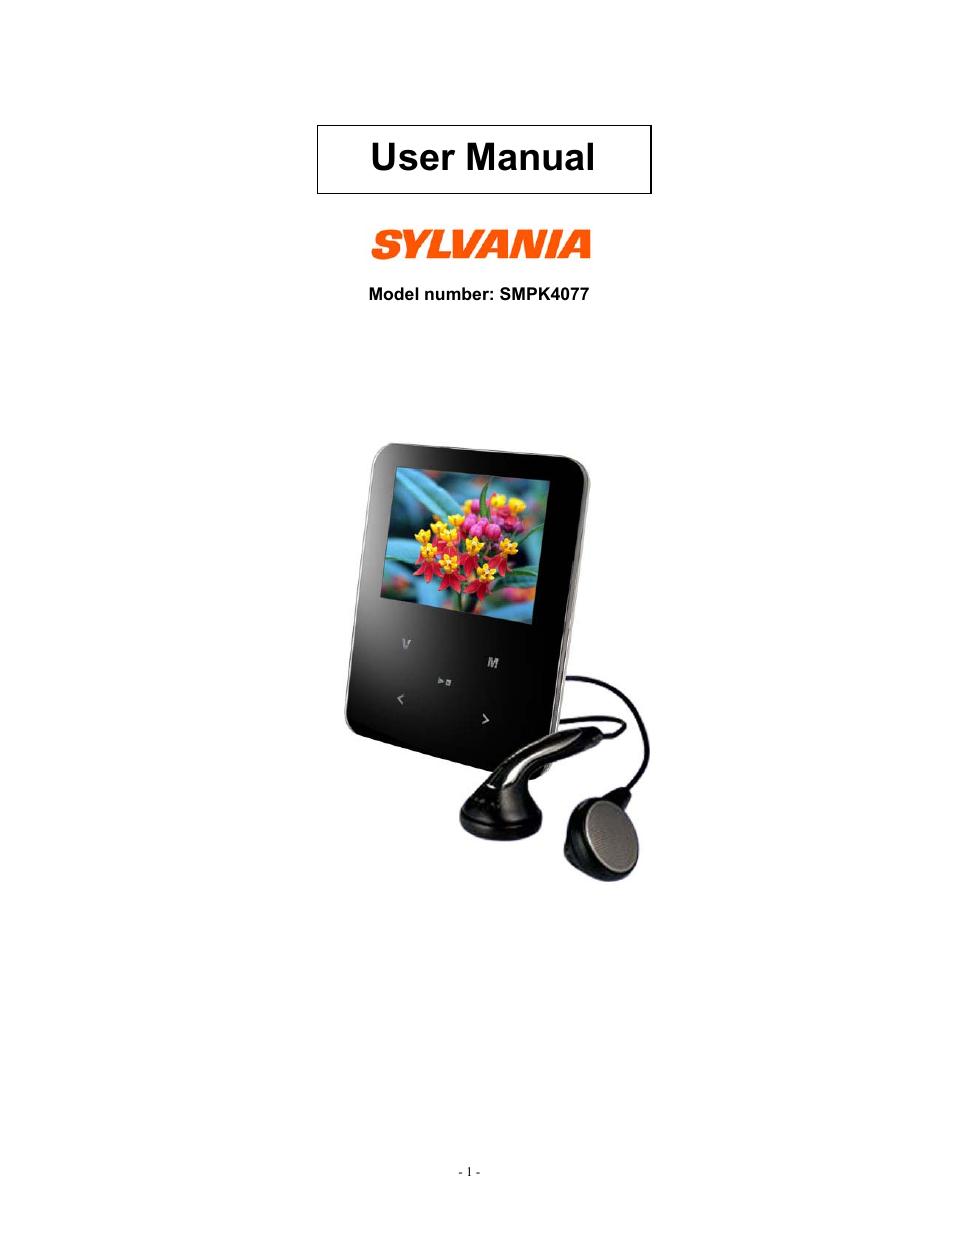 sylvania smpk4077 user manual 18 pages rh manualsdir com Sylvania MP3 Player Support Sylvania MP3 Player Review